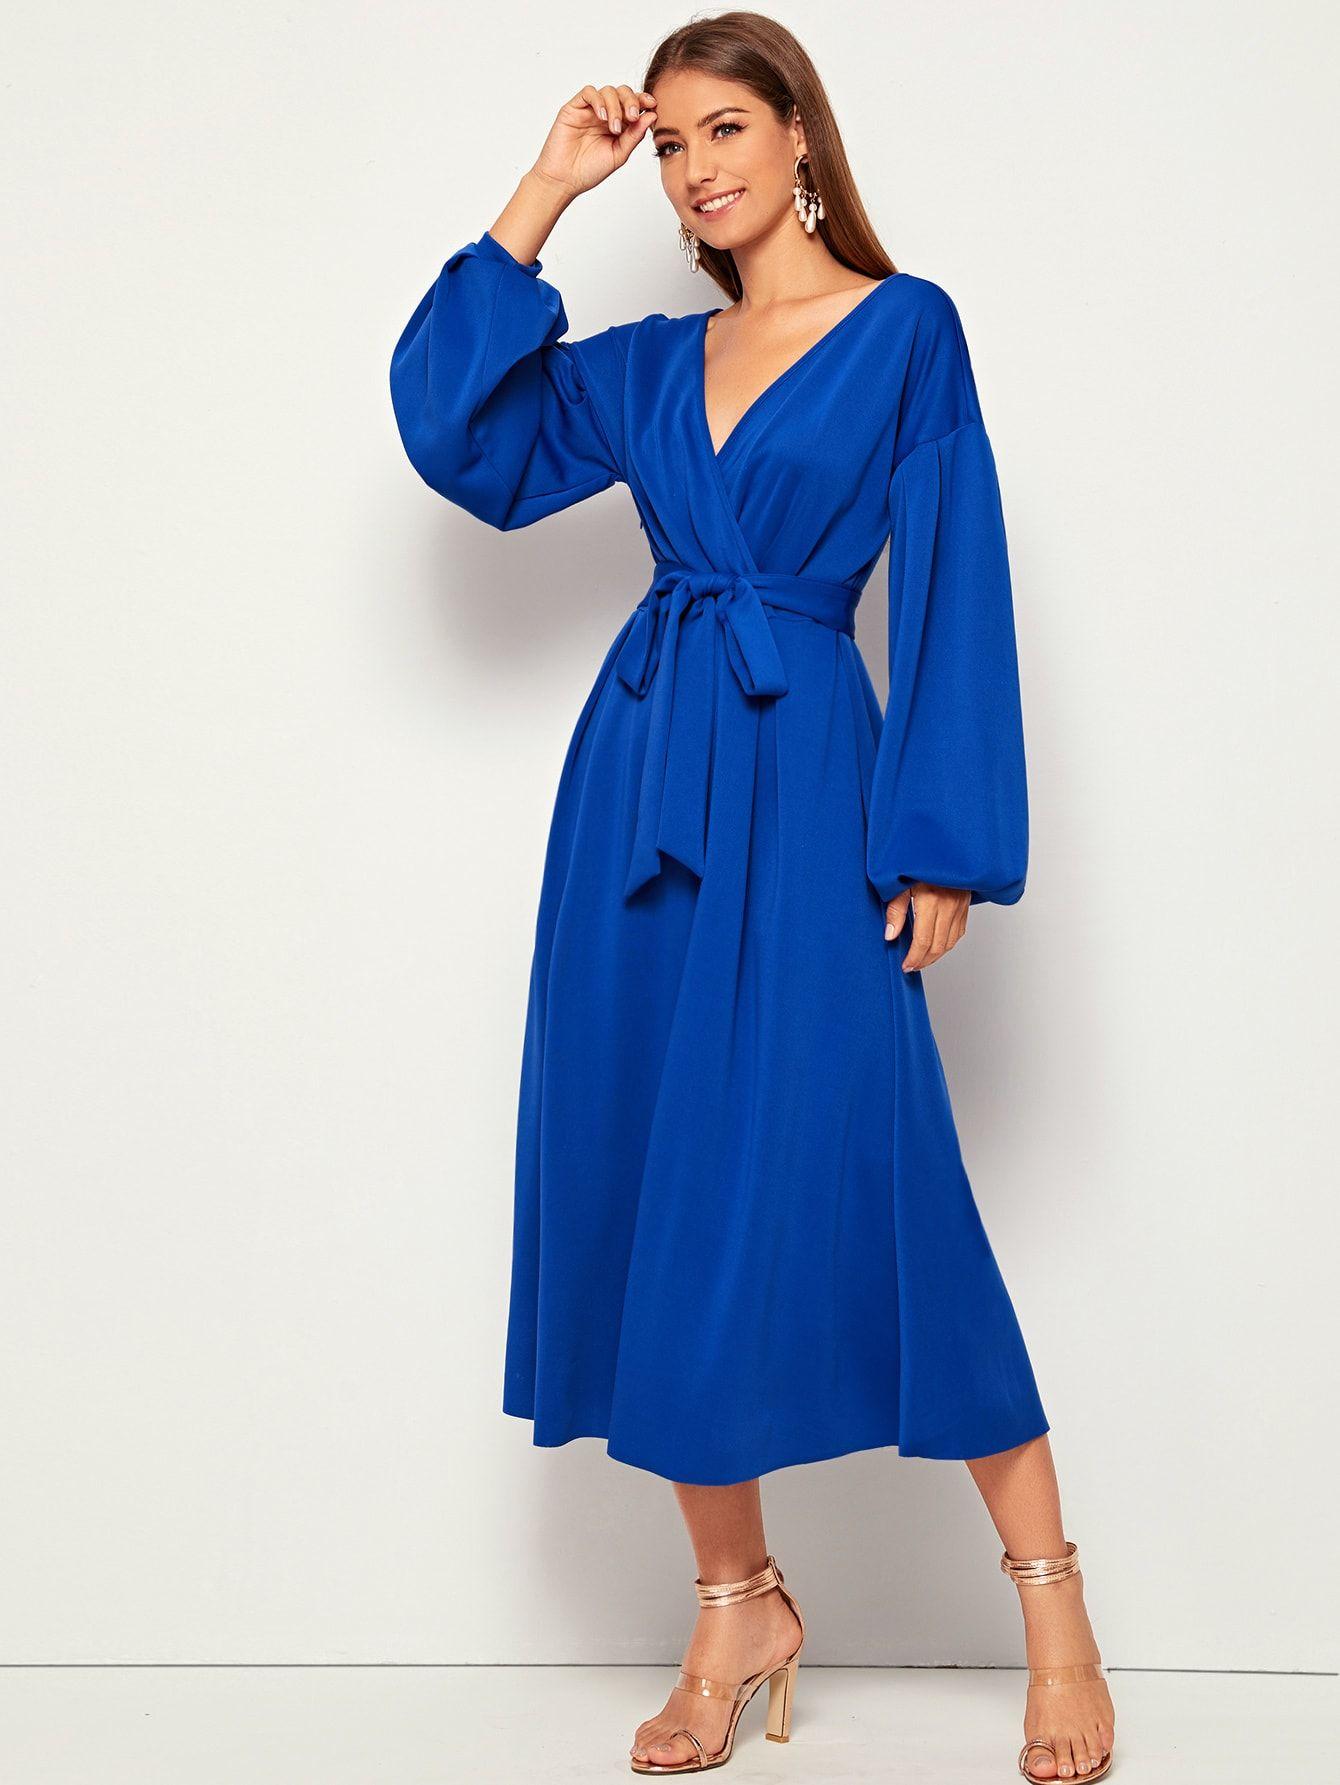 Ad Lantern Sleeve Surplice Wrap Belted Dress Tags Elegant Blue Bright Plain V Neck Long A Line Wrap Belted P Belted Wrap Dress Belted Dress Dresses [ 1785 x 1340 Pixel ]